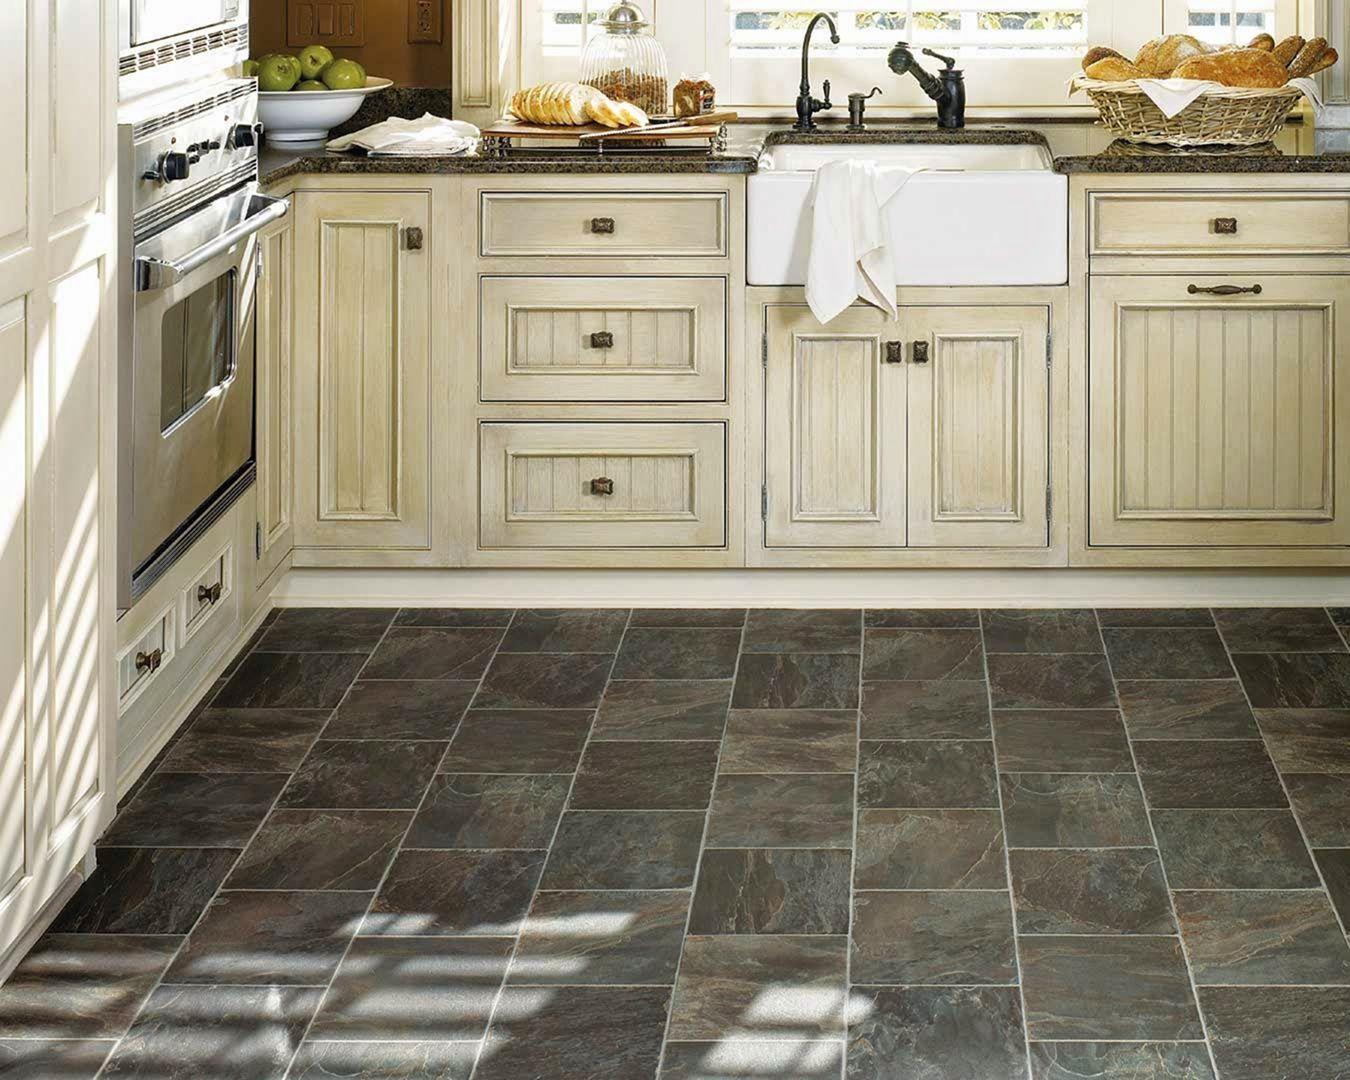 30 spectacular wood floor ideas for amazing kitchen kitchen flooring vinyl sheet flooring on kitchen flooring ideas id=16140